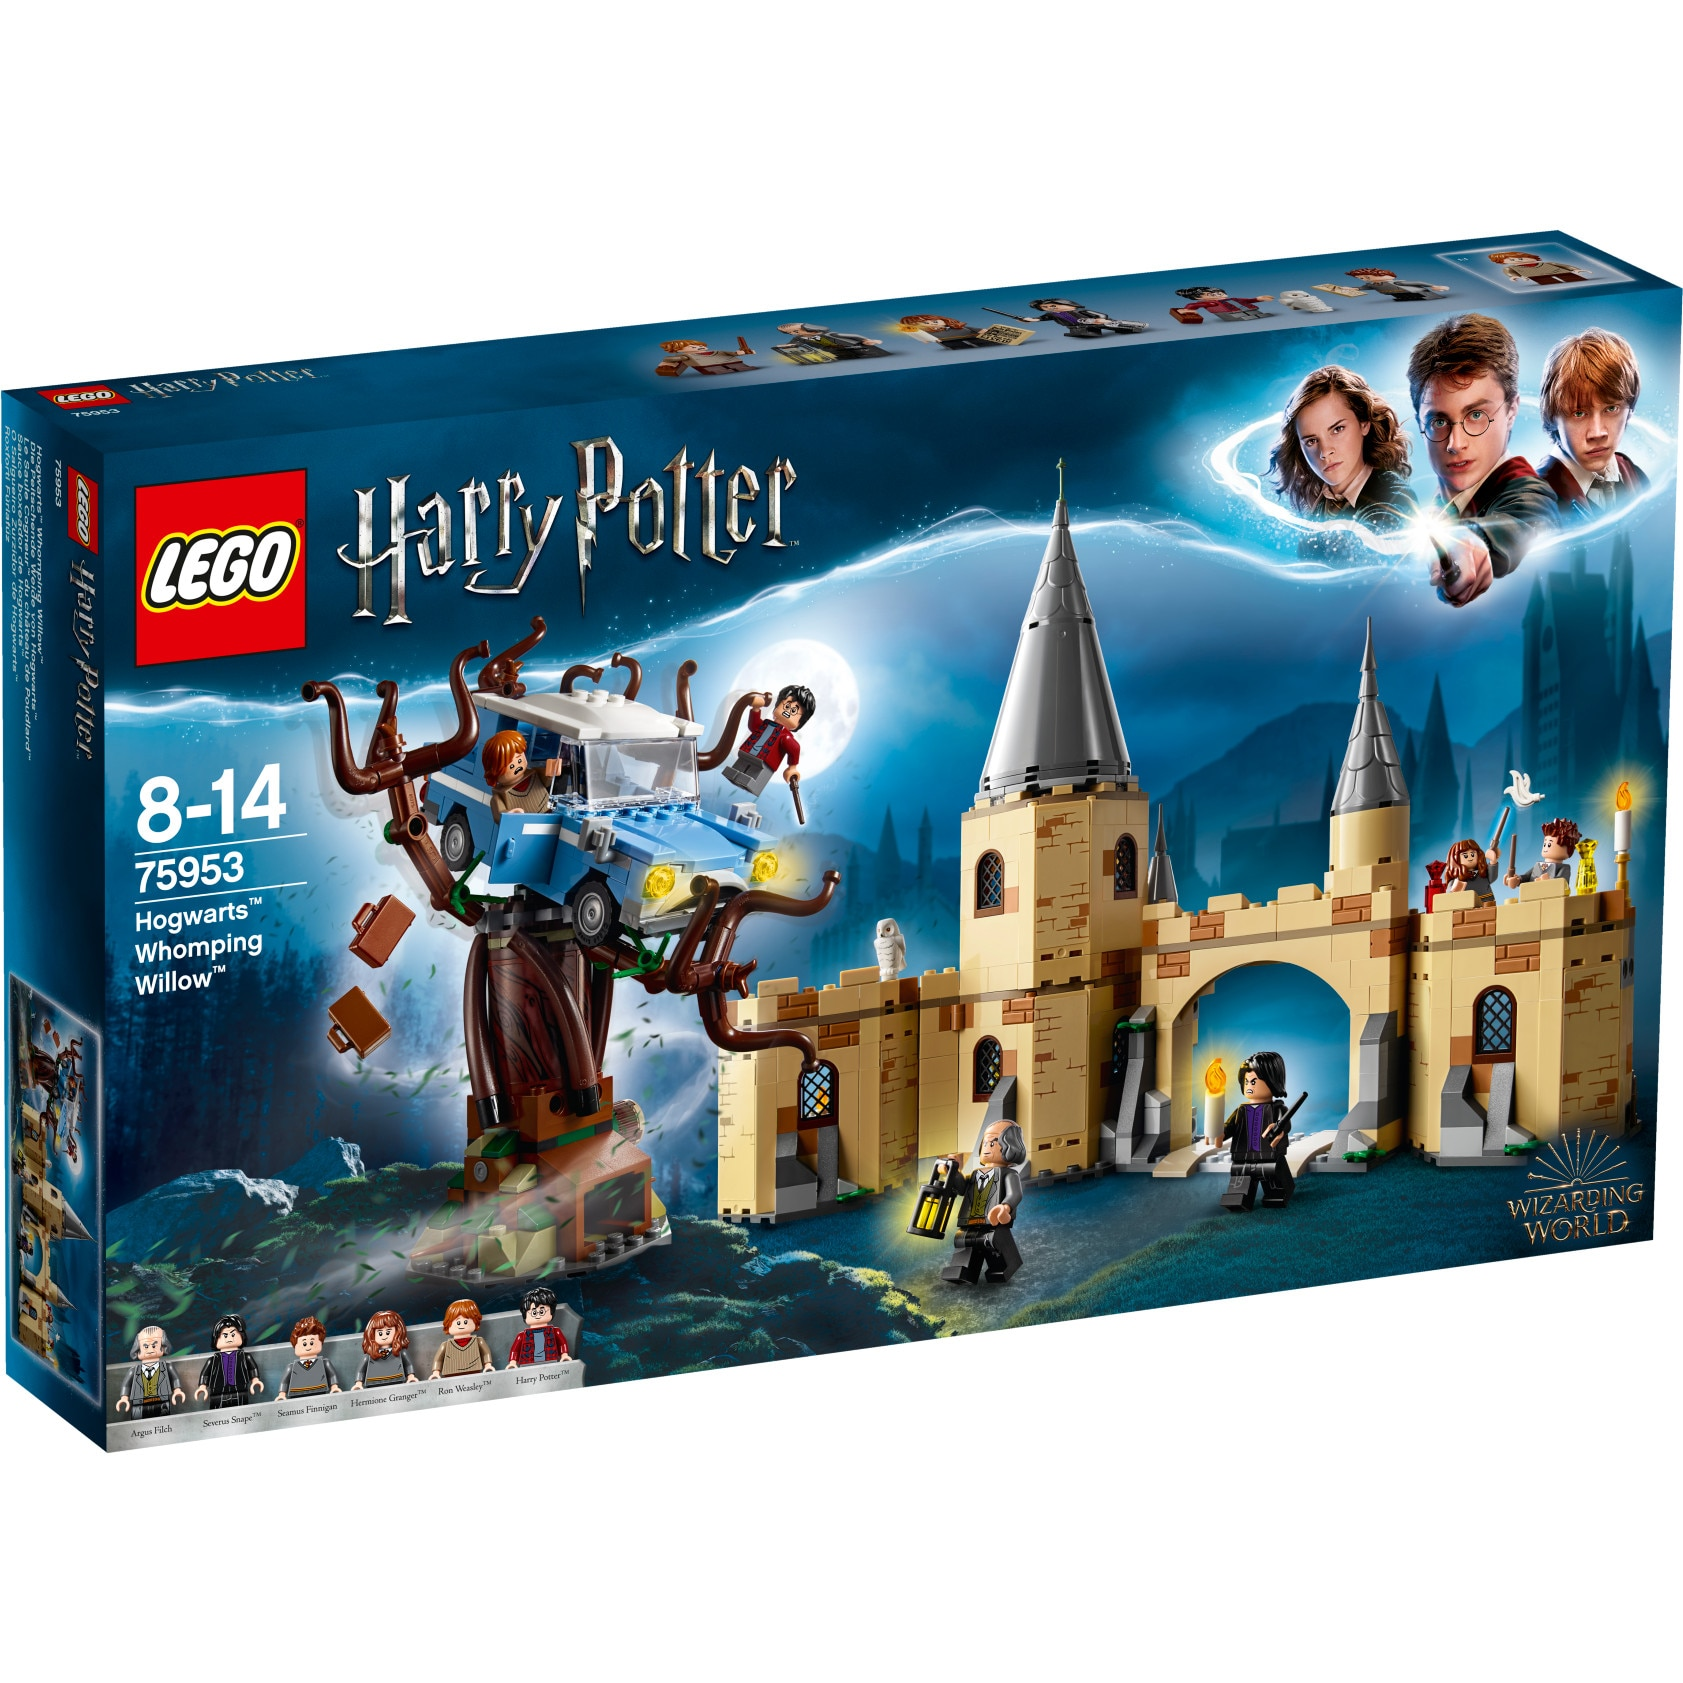 Fotografie LEGO Harry Potter - Hogwarts Whomping Willow 75953